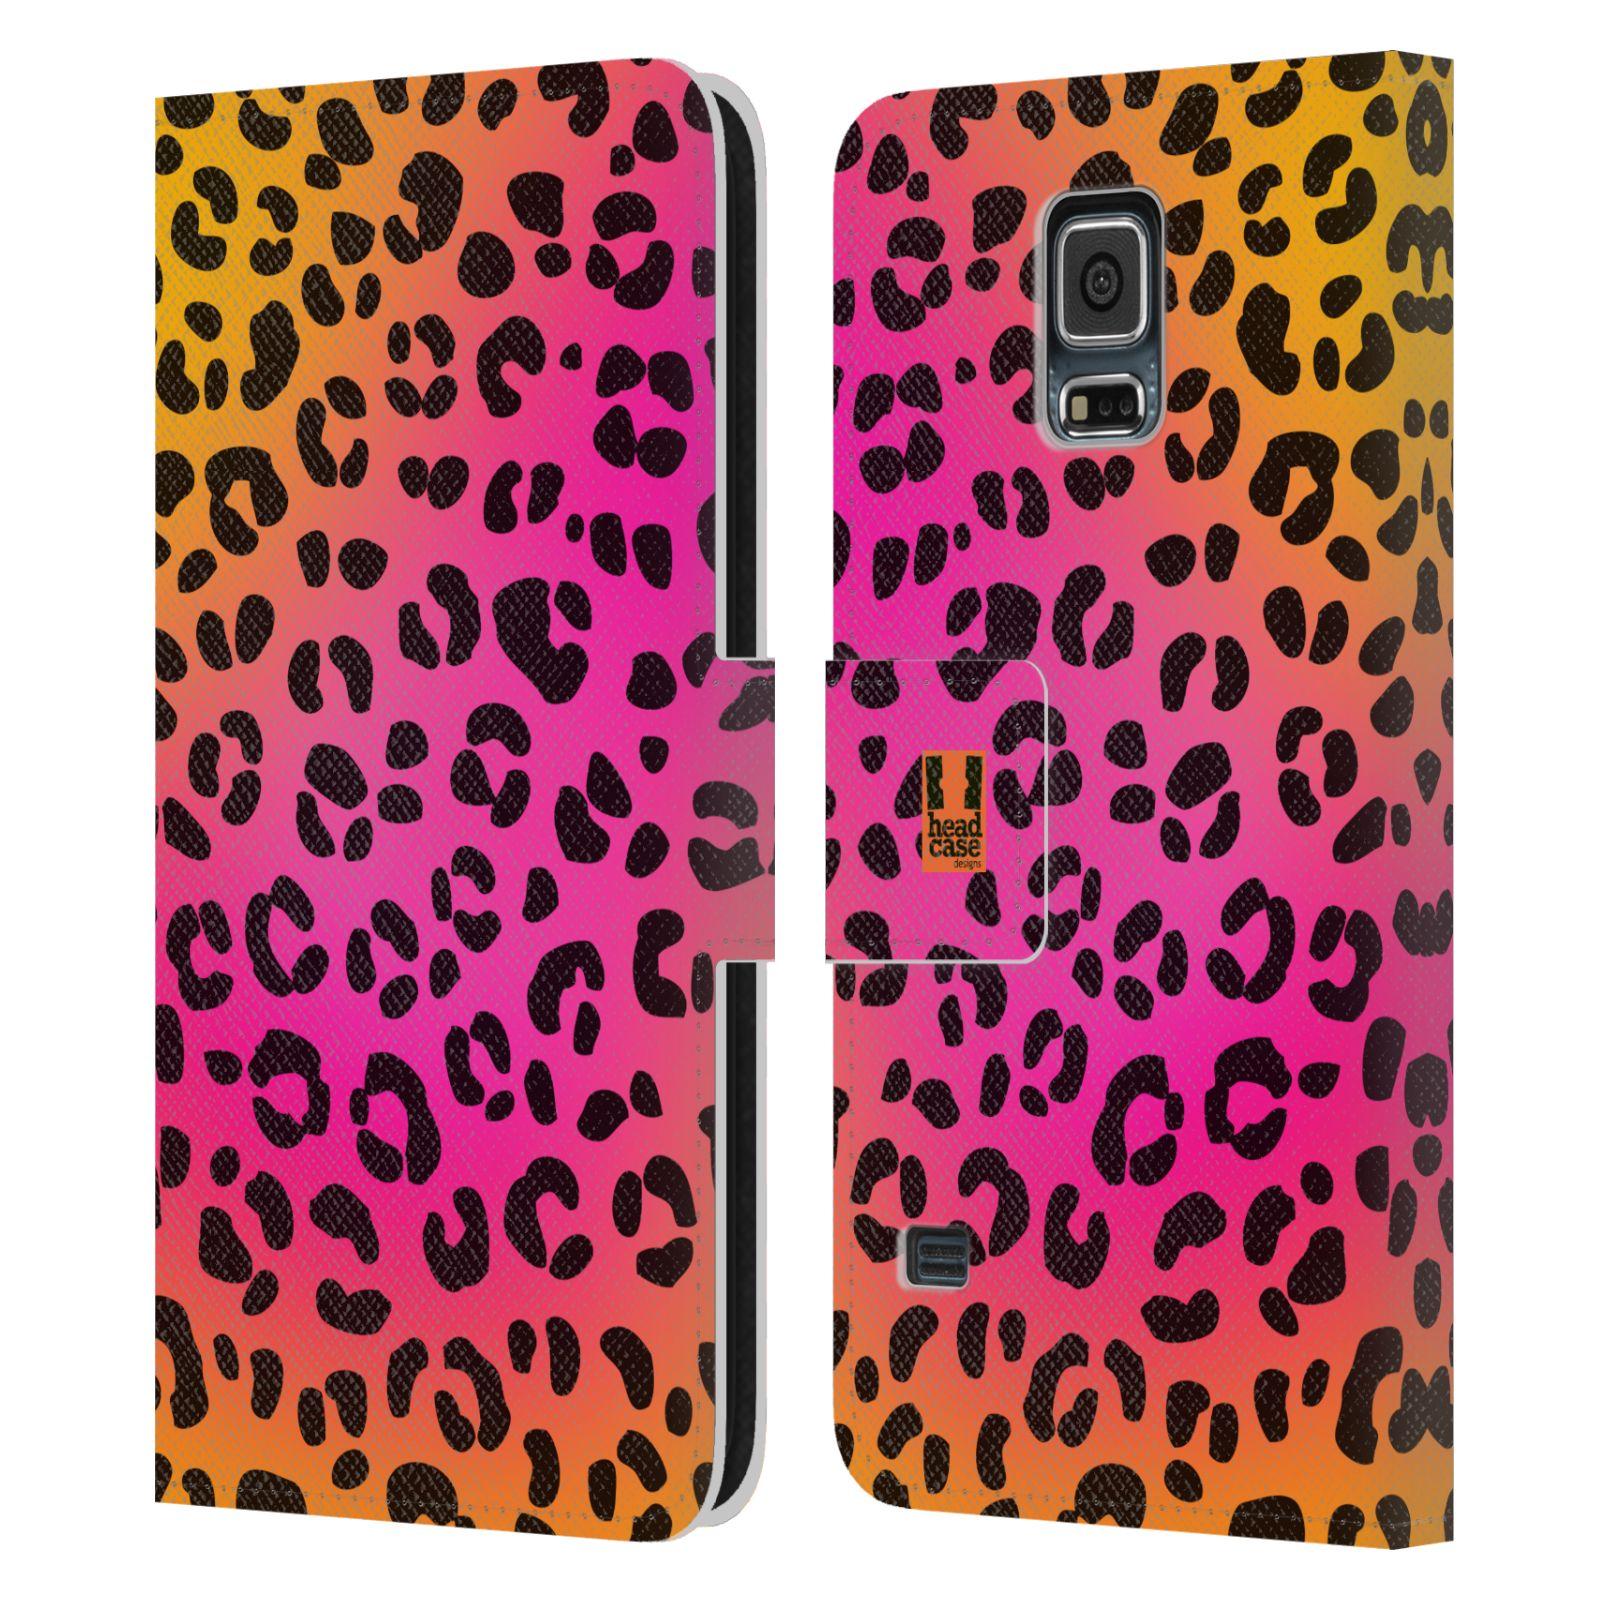 HEAD CASE Flipové pouzdro pro mobil Samsung Galaxy S5 / S5 NEO Zvířecí barevné vzory růžový leopard